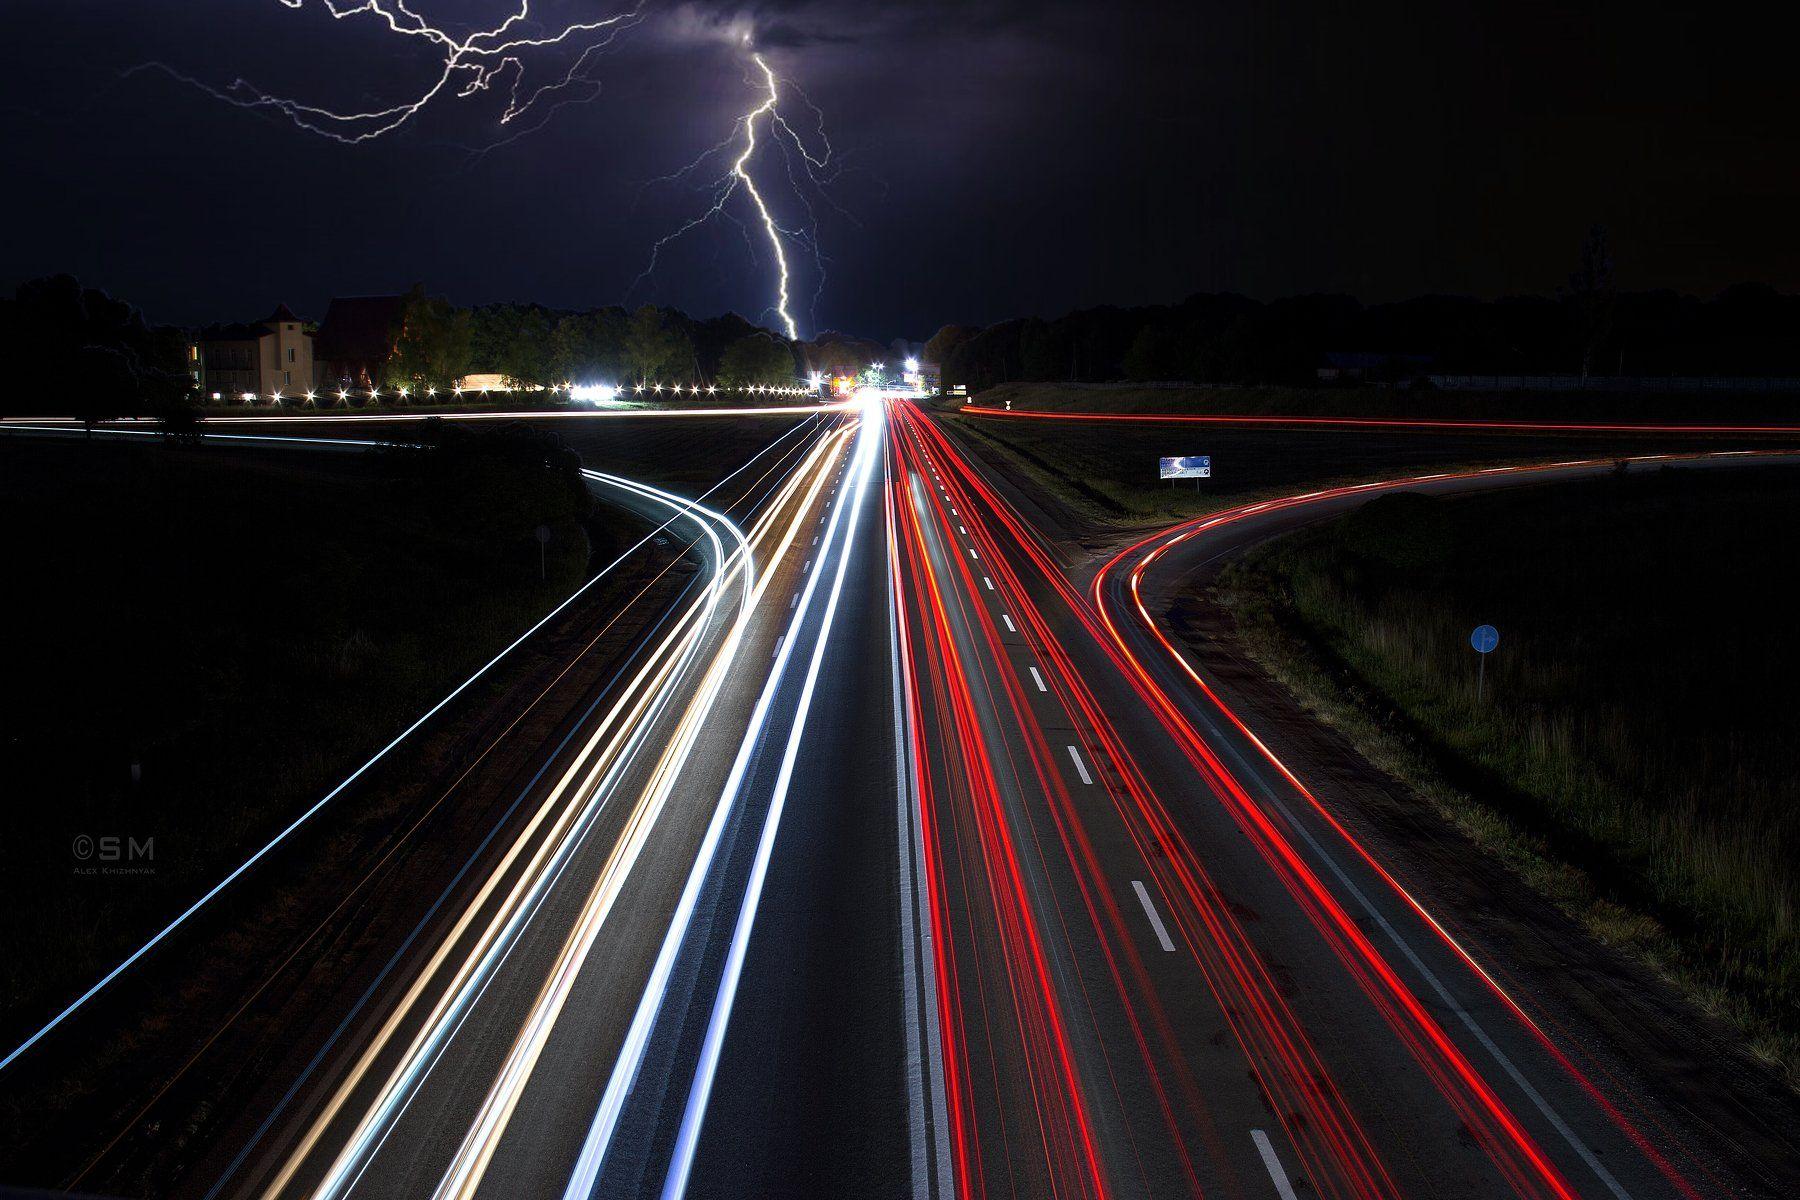 road, street, light, thunder, cloud, night, Simplici_mortE